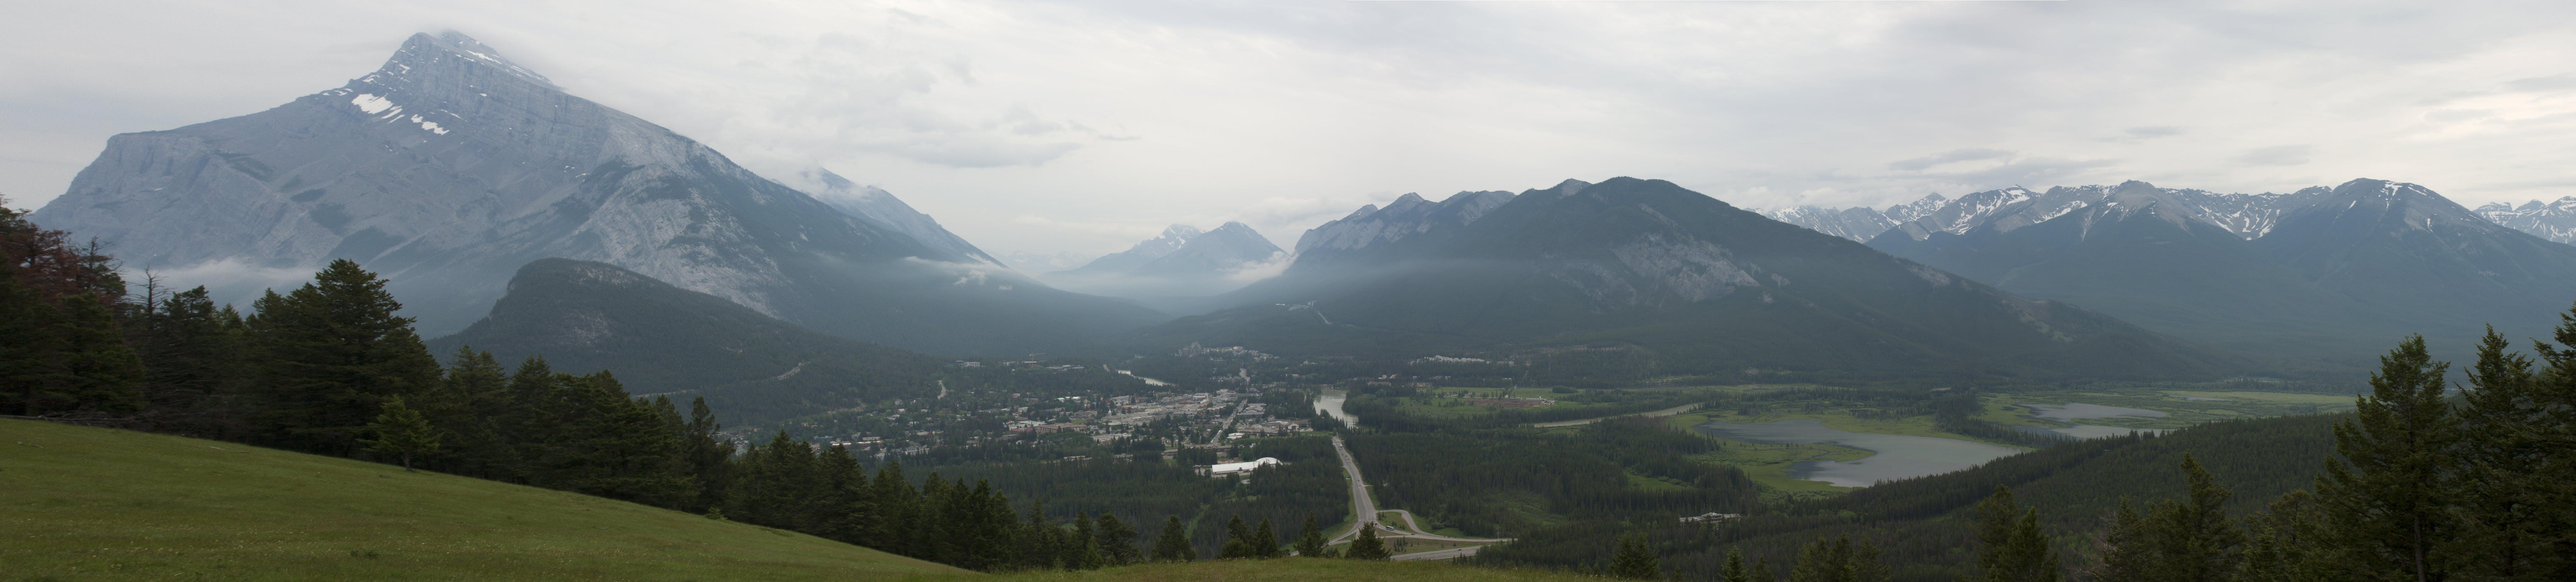 Kostenloses Stock Foto zu berg, berge, draußen, kanada